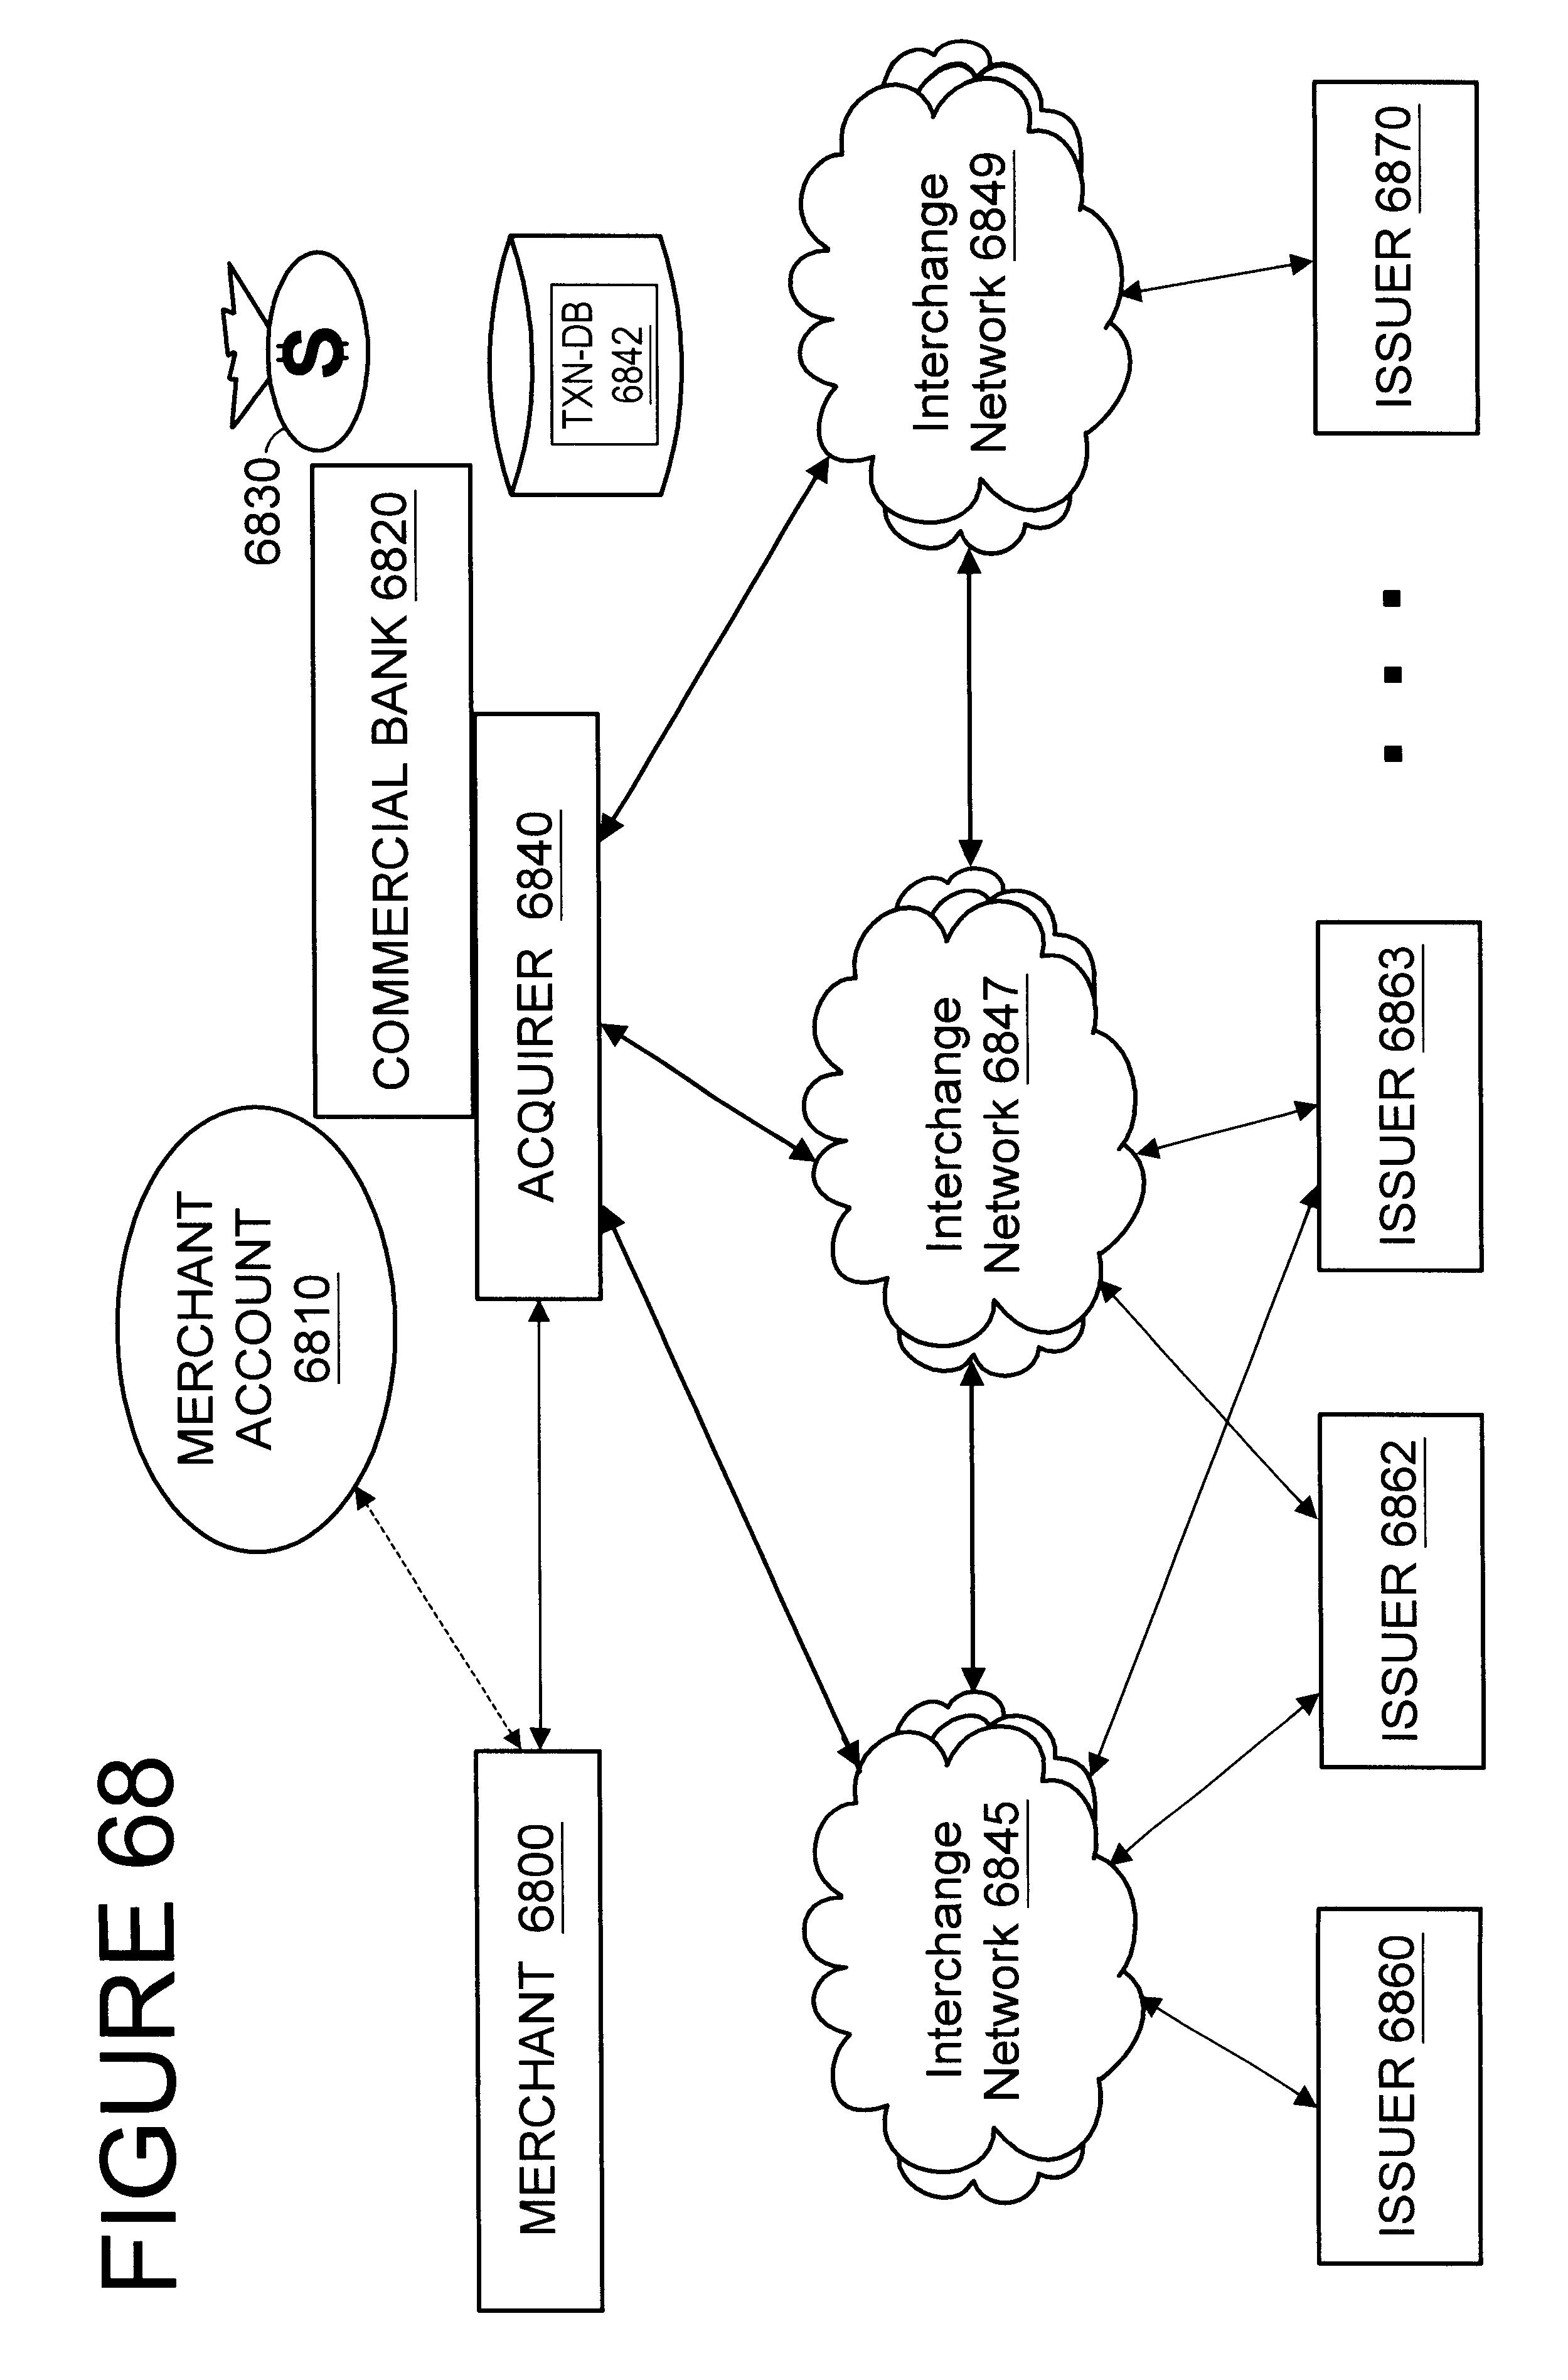 Patent US 6,324,525 B1